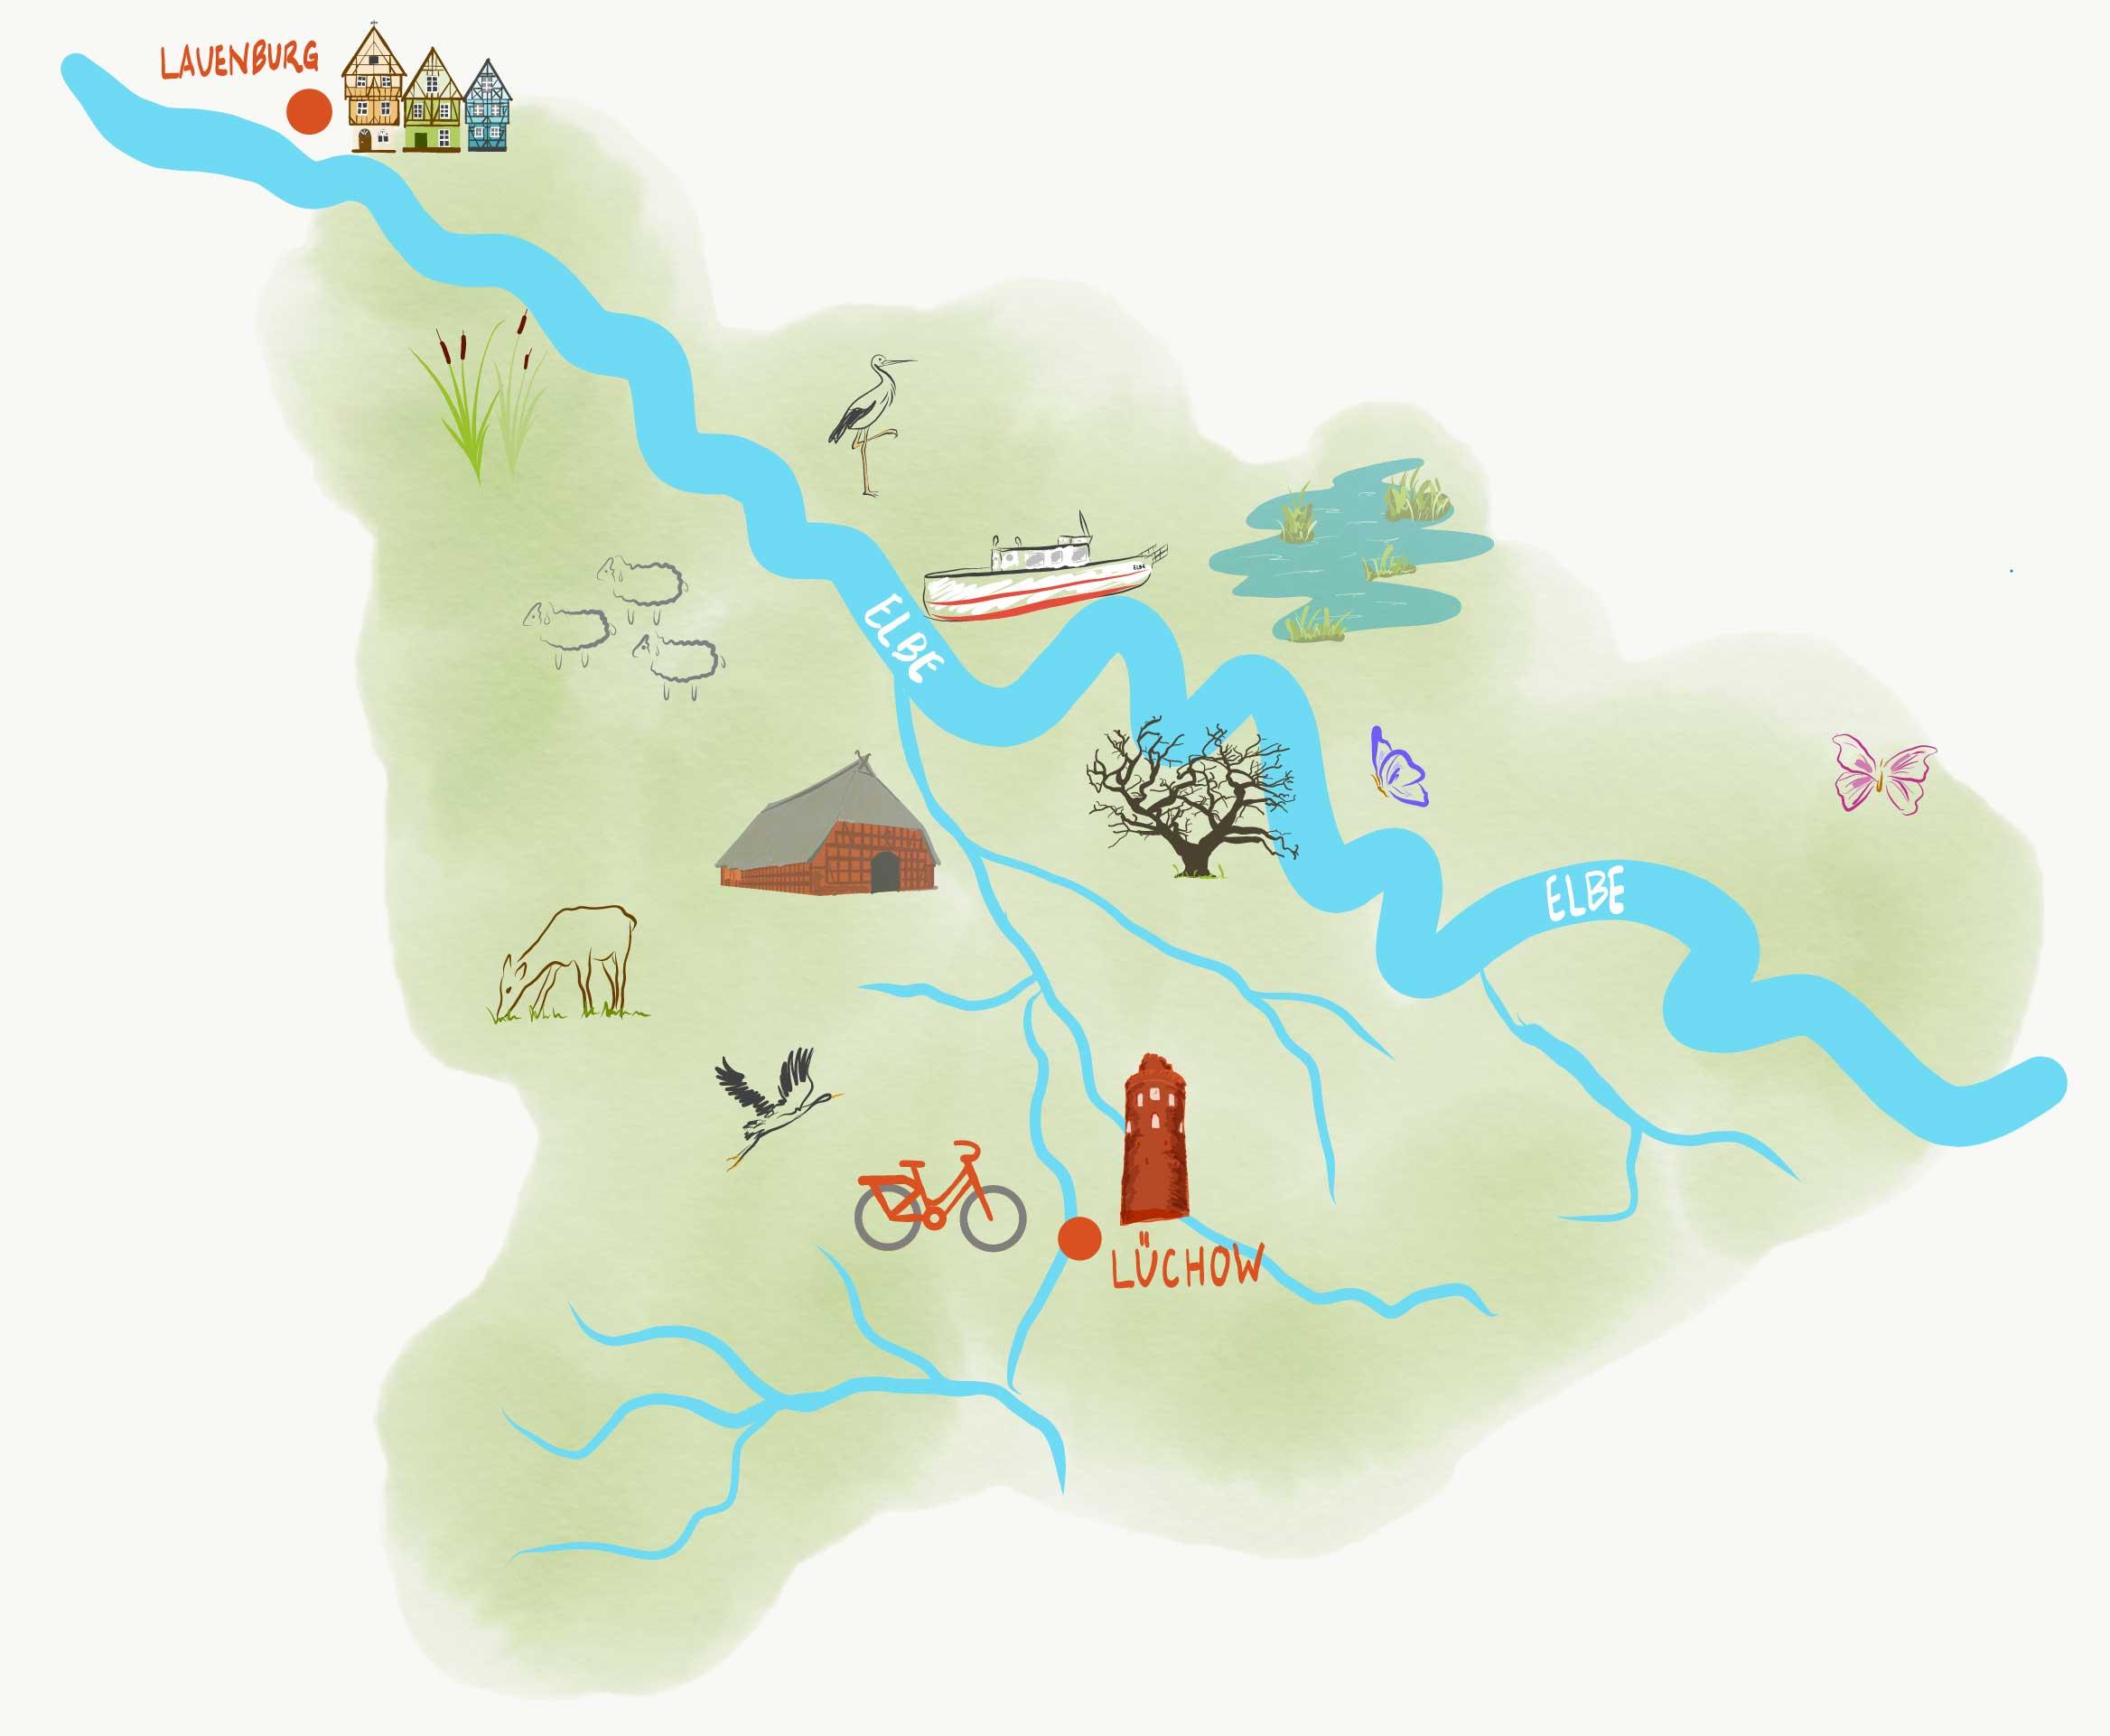 Wendland map